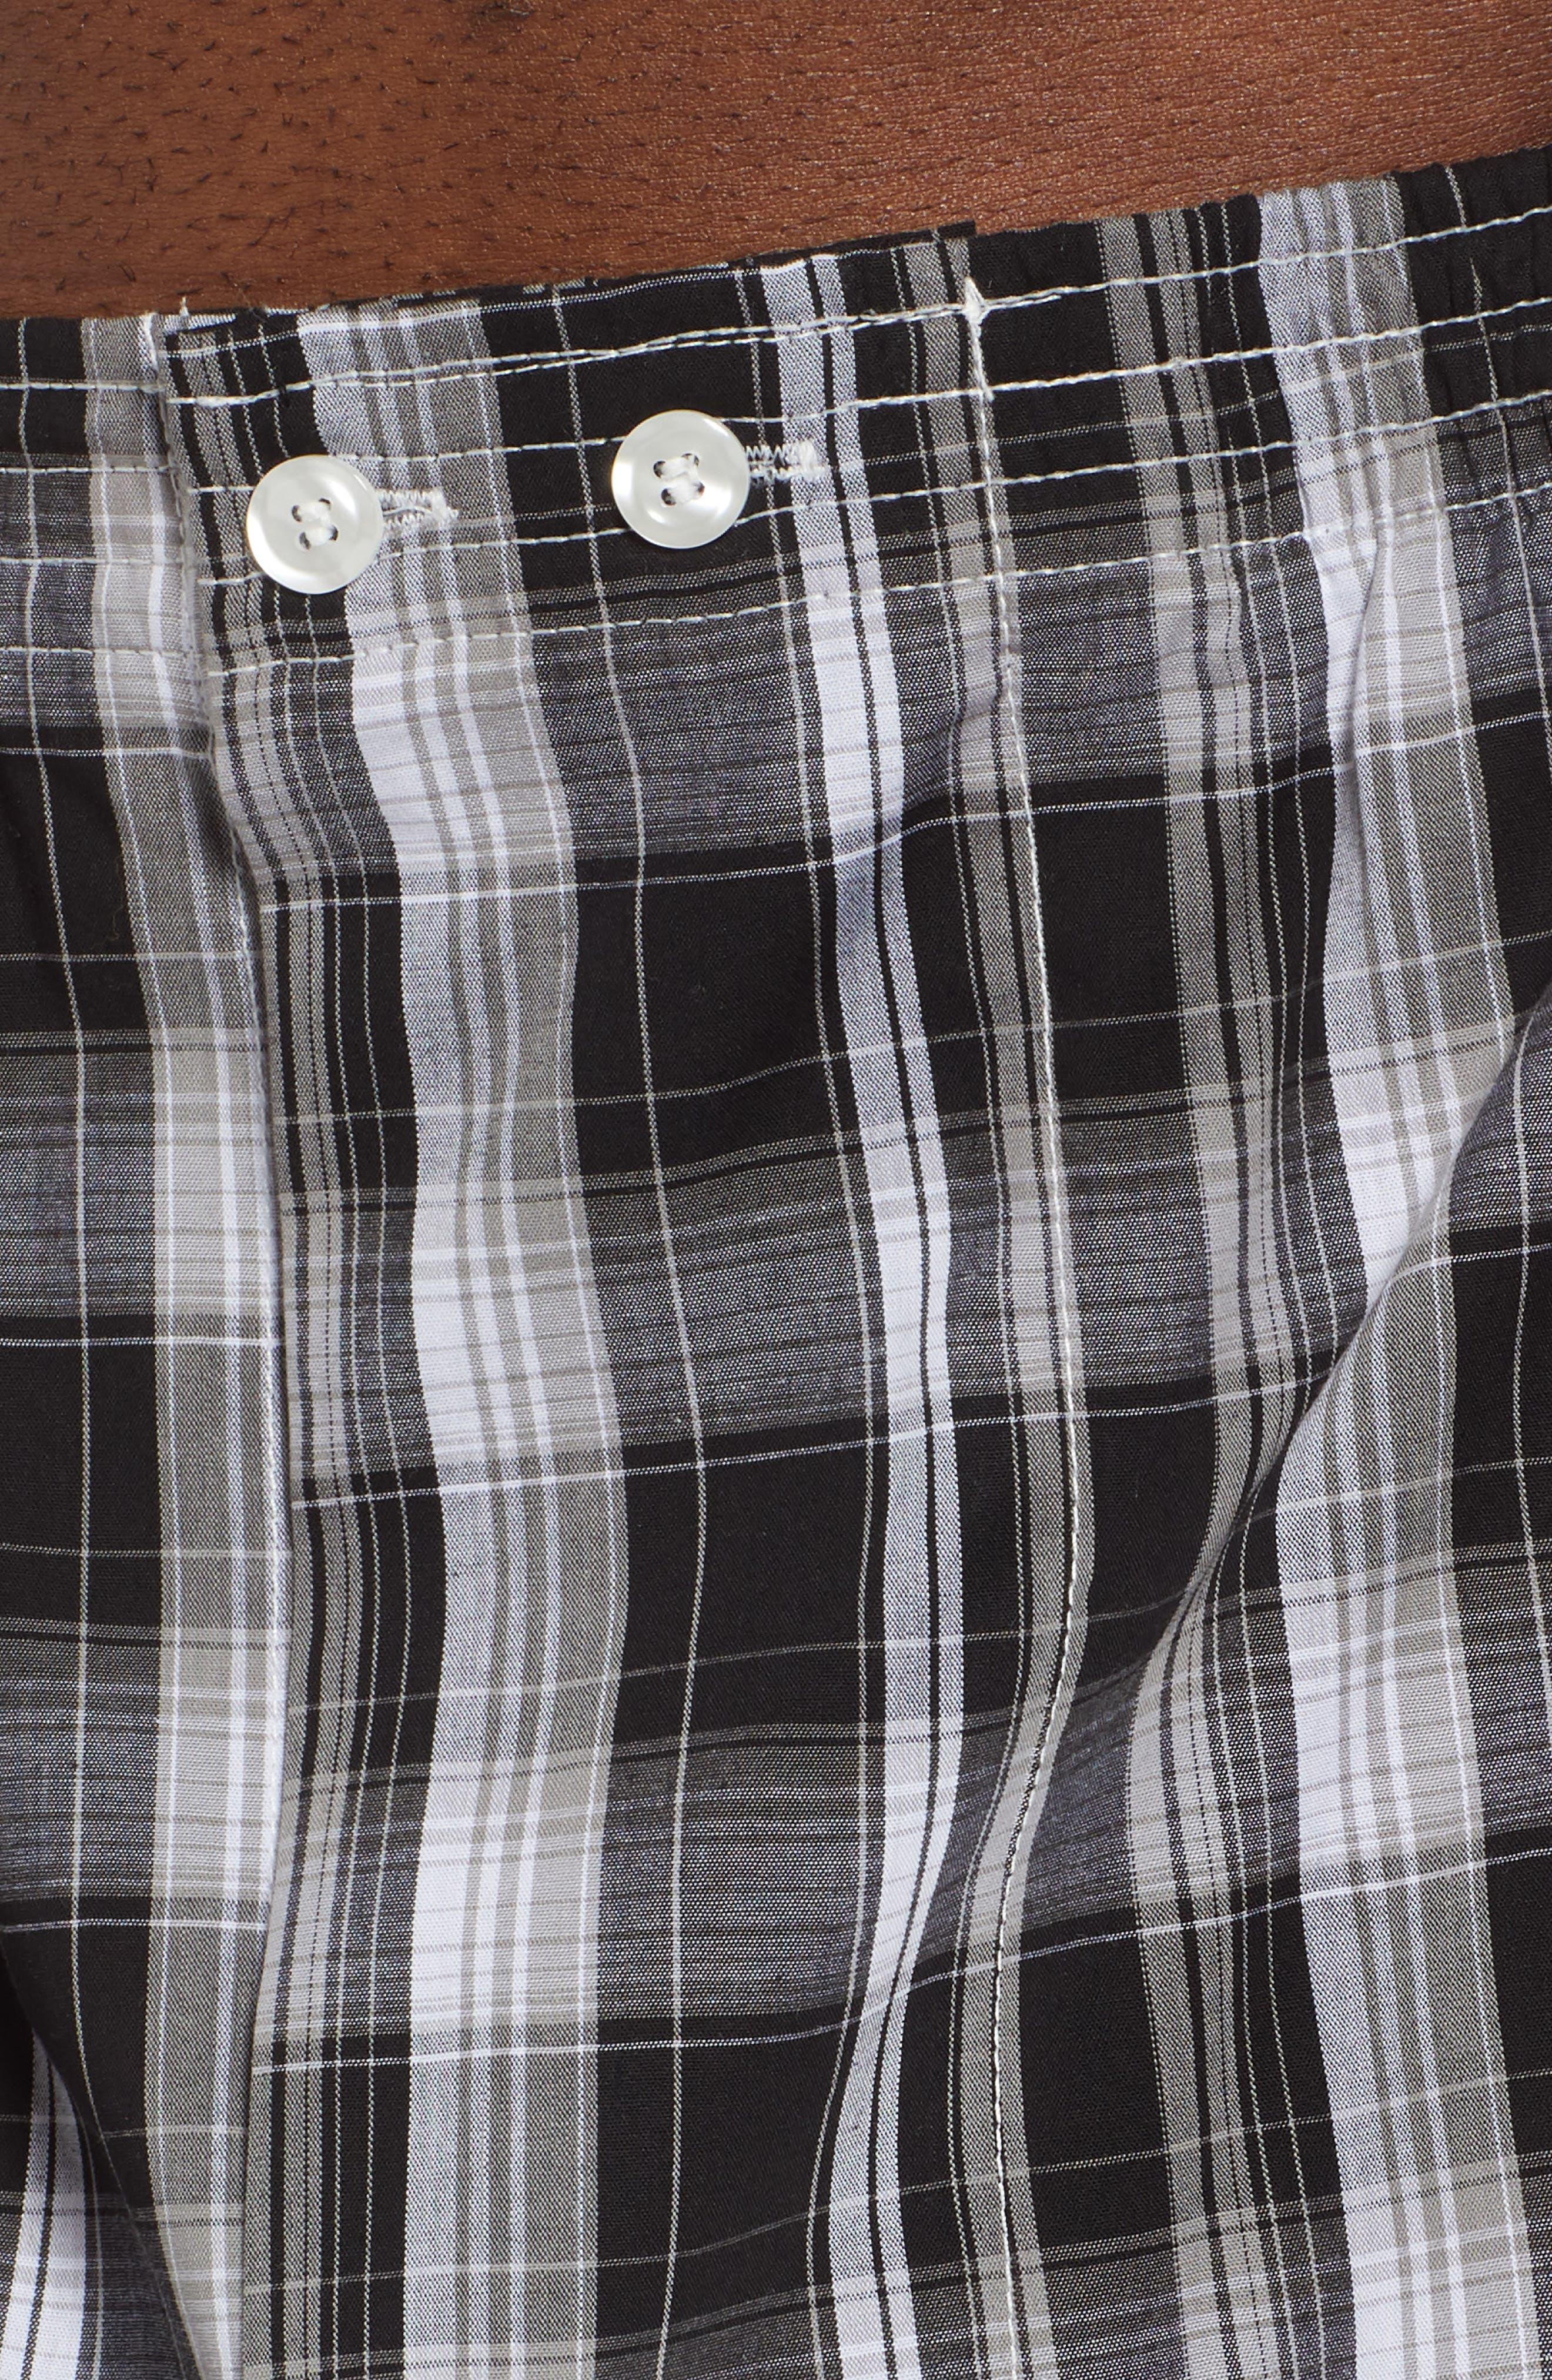 NORDSTROM MEN'S SHOP, 3-Pack Classic Fit Boxers, Alternate thumbnail 5, color, BLACK- WHITE PLAID PACK